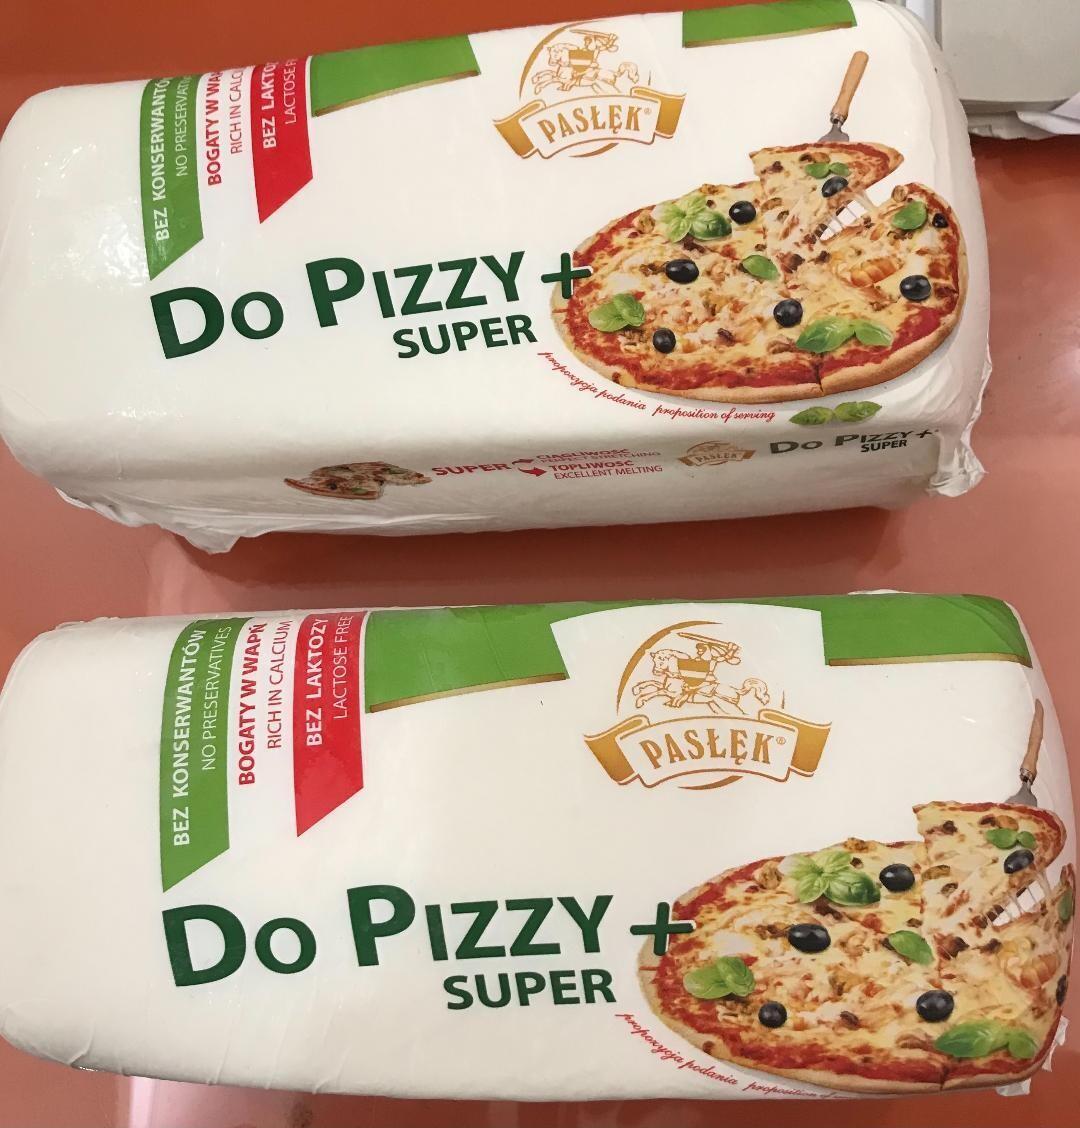 DO PIZZY SUPER MOZZARELLA CHEESE 2.4kg-2.5kg